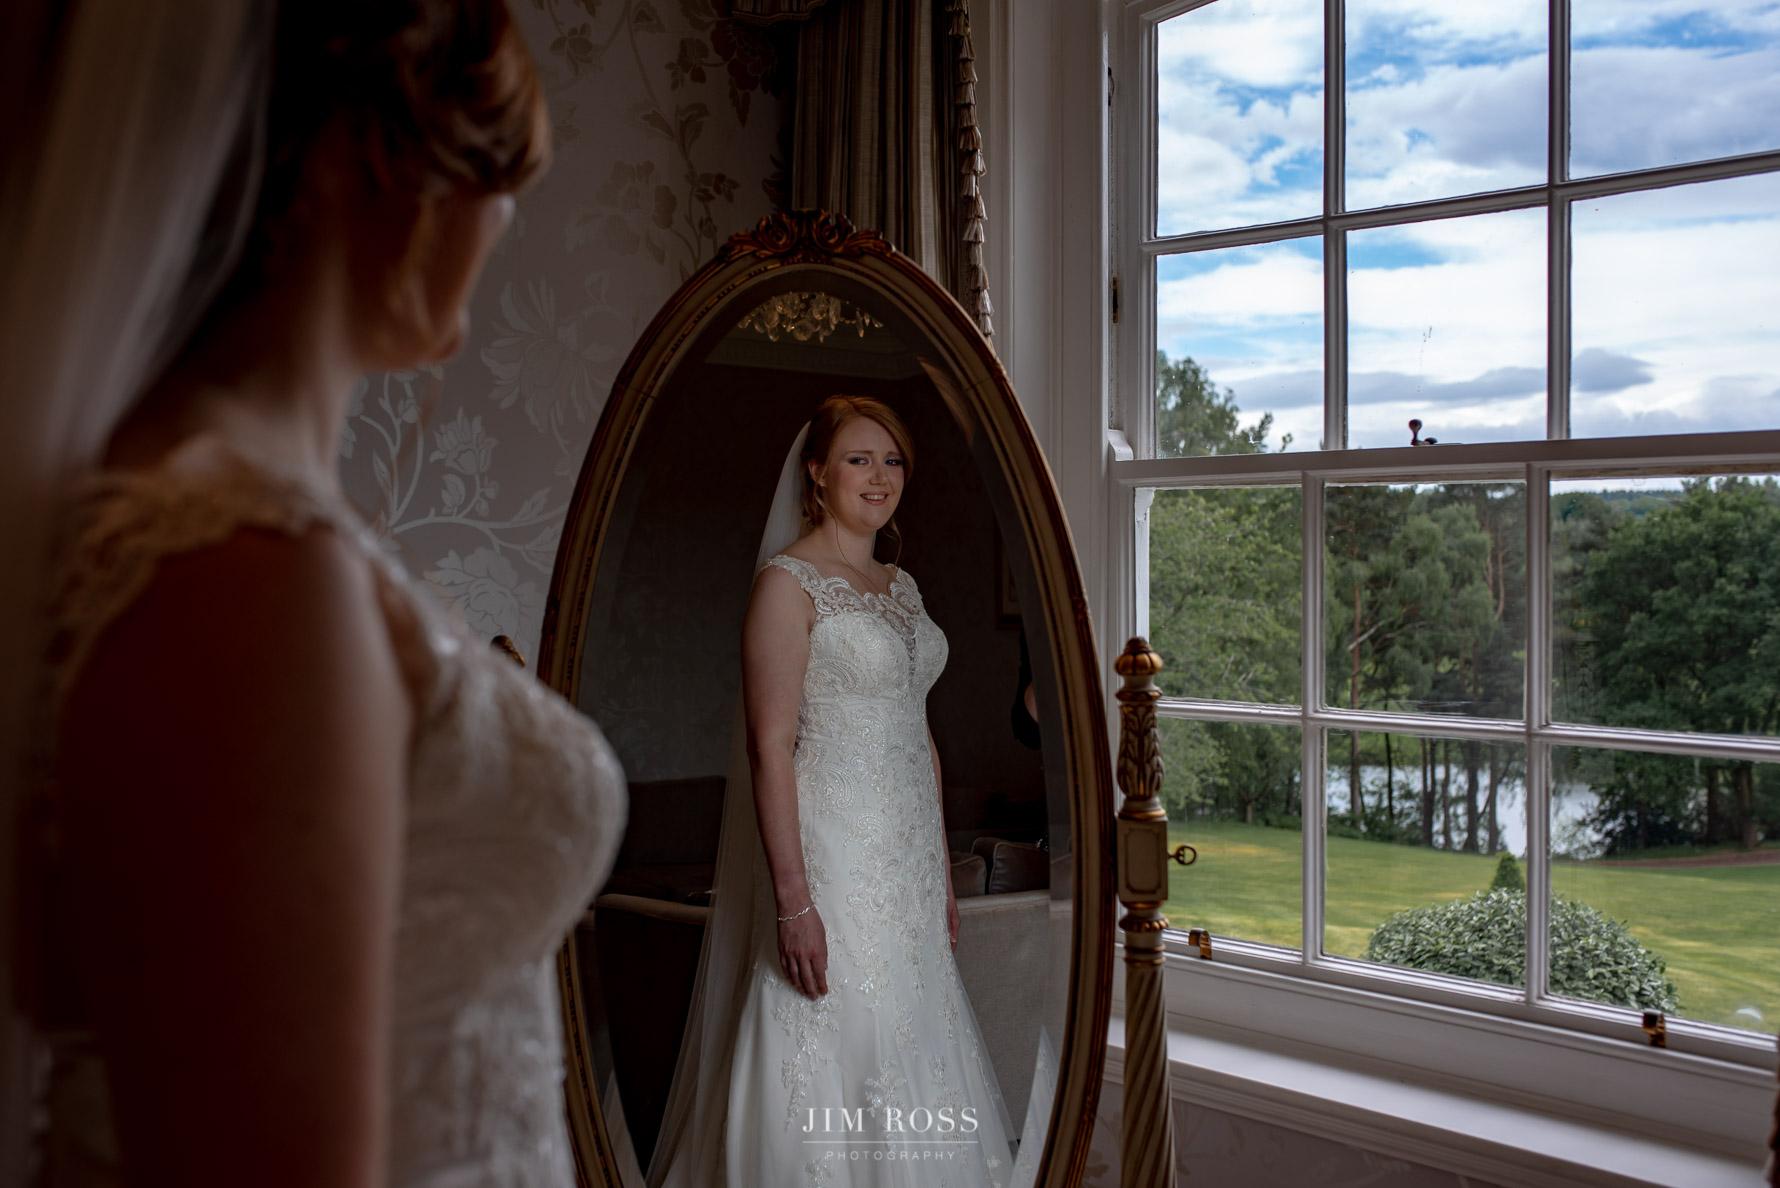 Bridal portrait in mirror